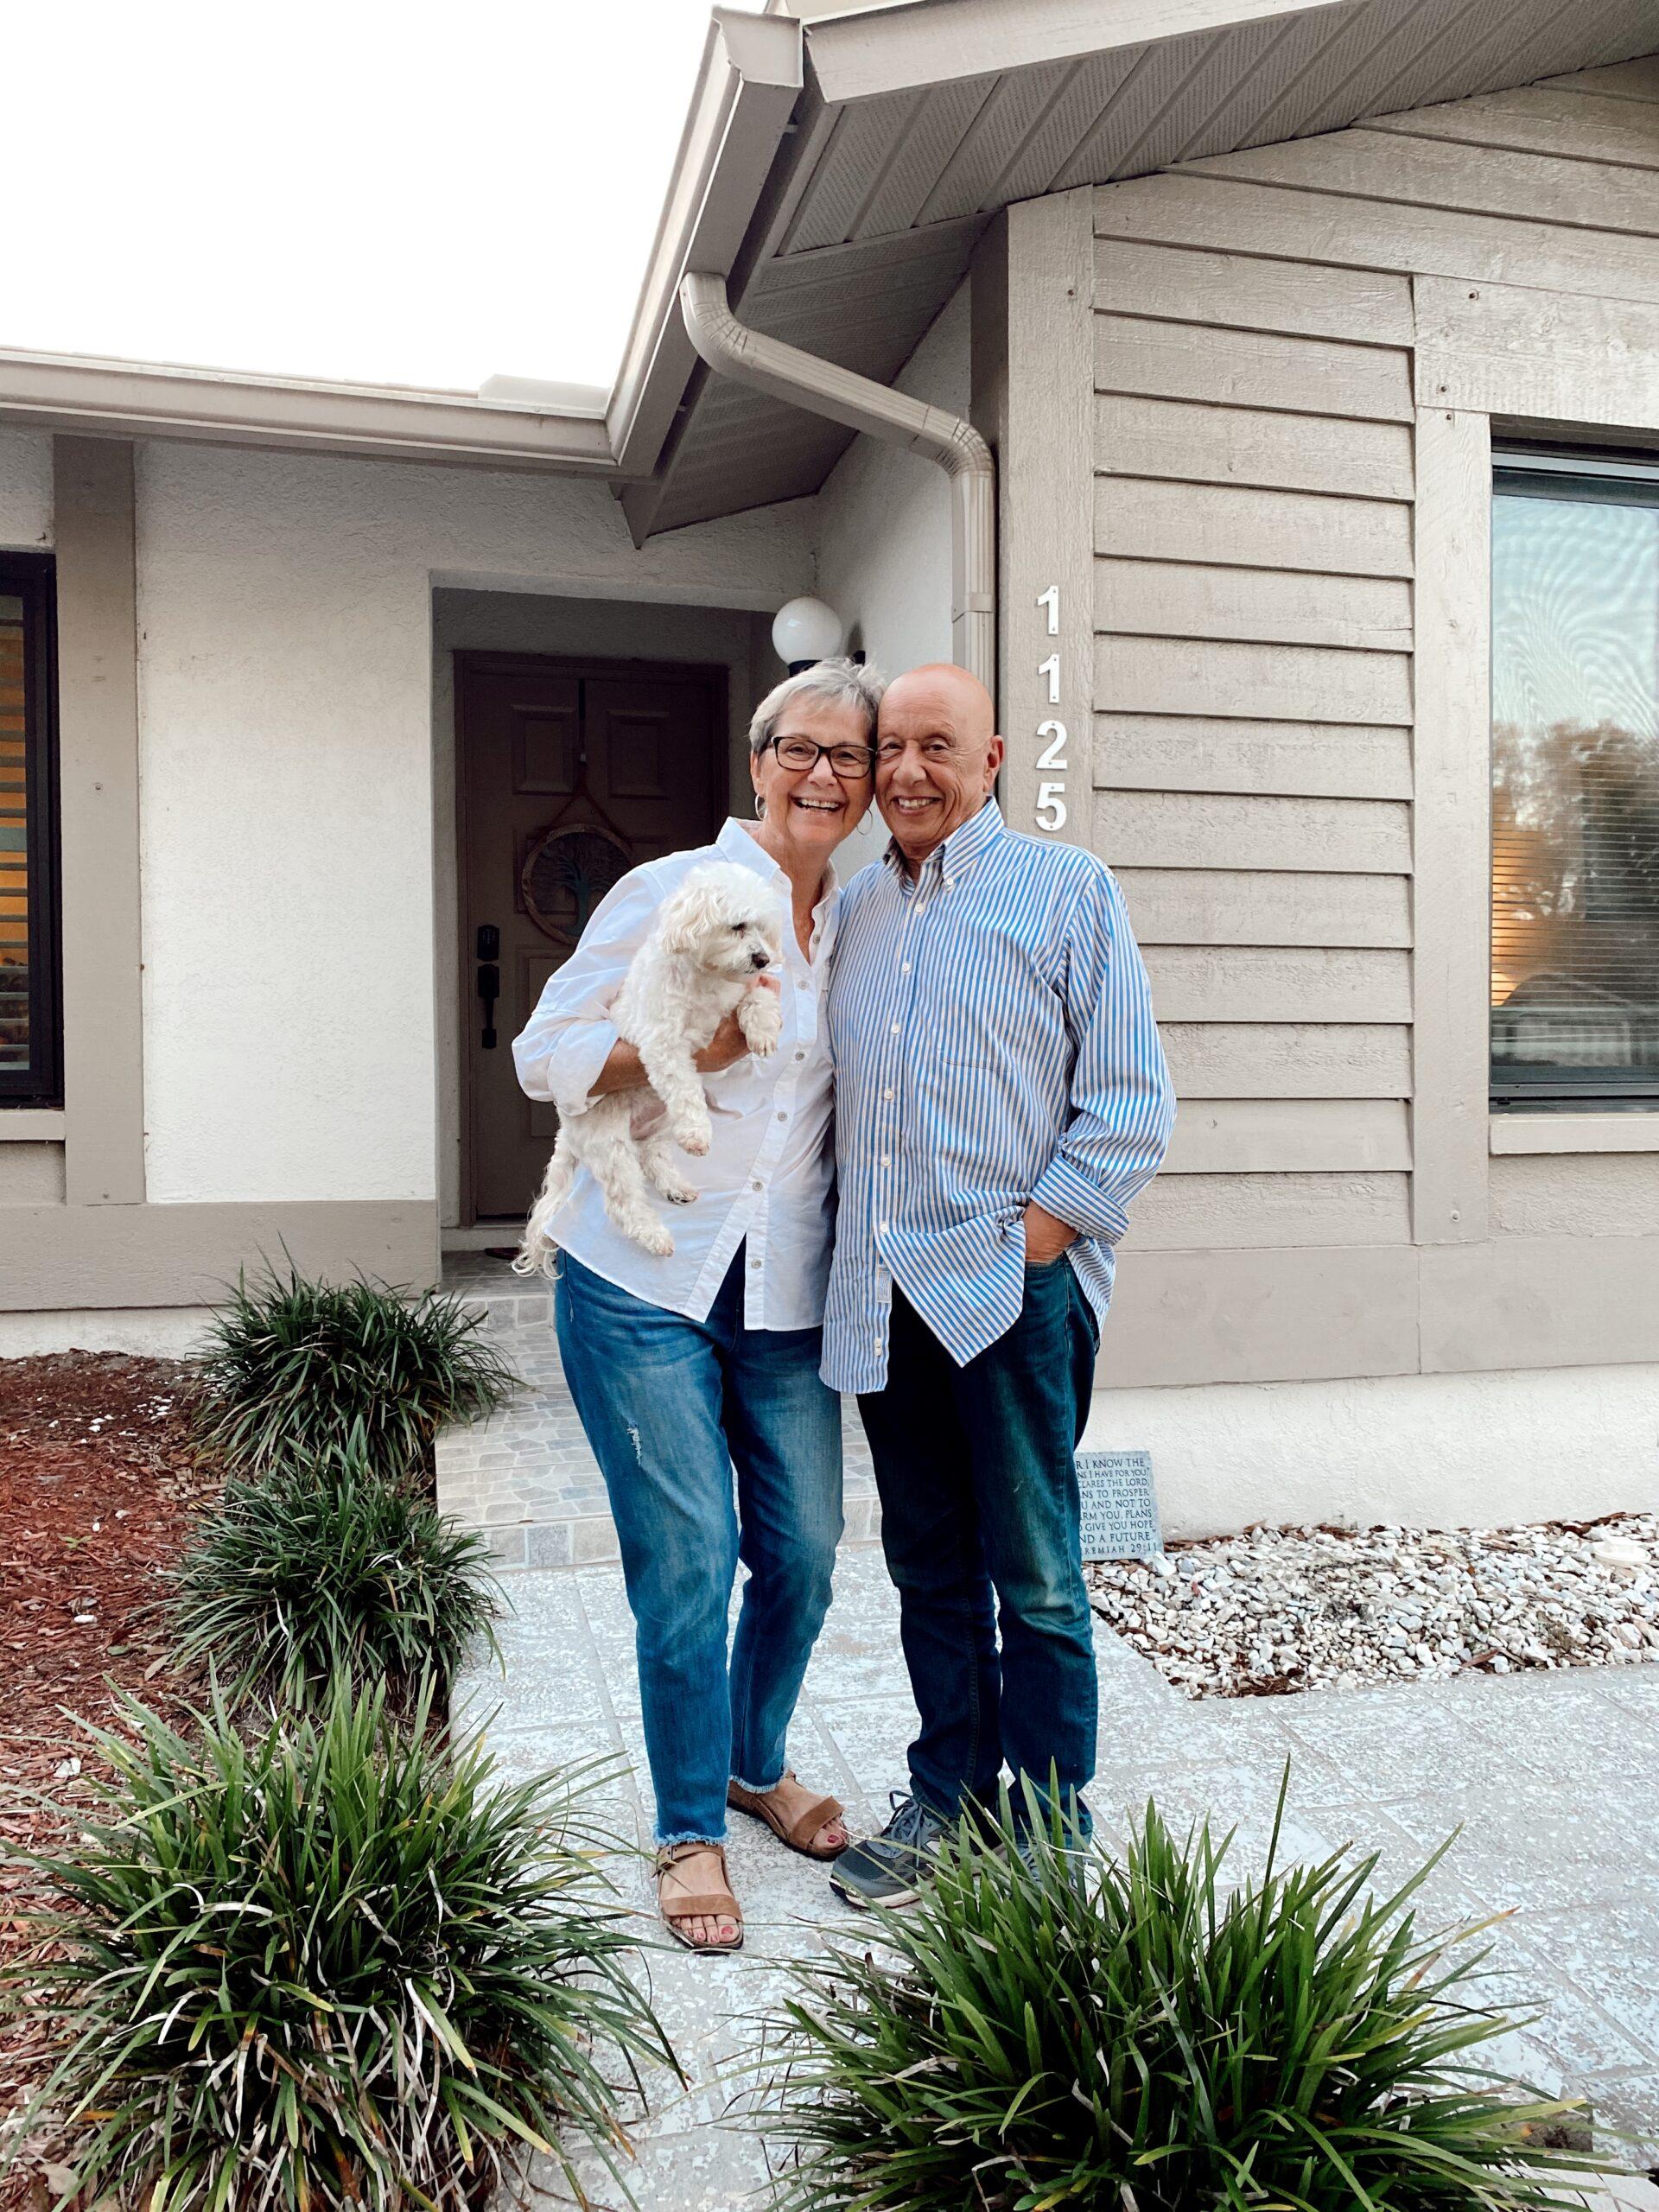 Ruthie Ridley Blog Florida 2021 Naples + Tampa